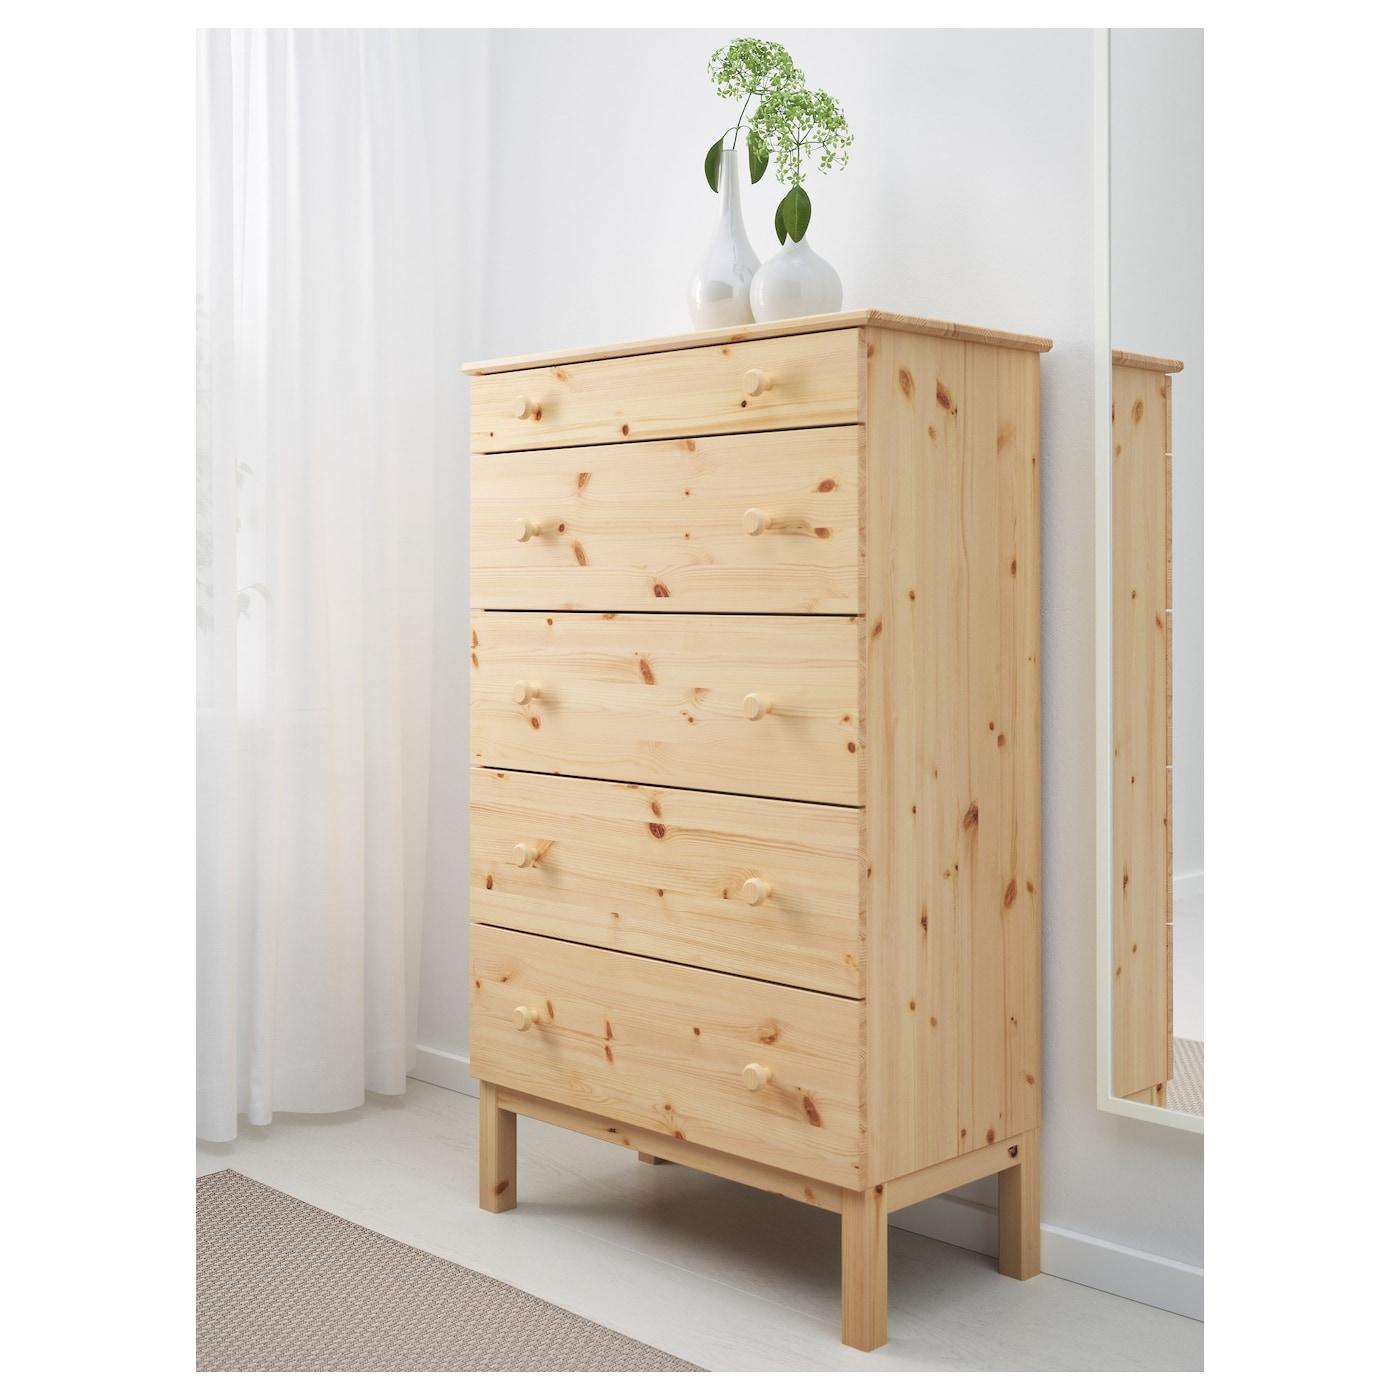 Tarva chest of 5 drawers pine 79x127 cm ikea - Ikea mesillas y comodas ...